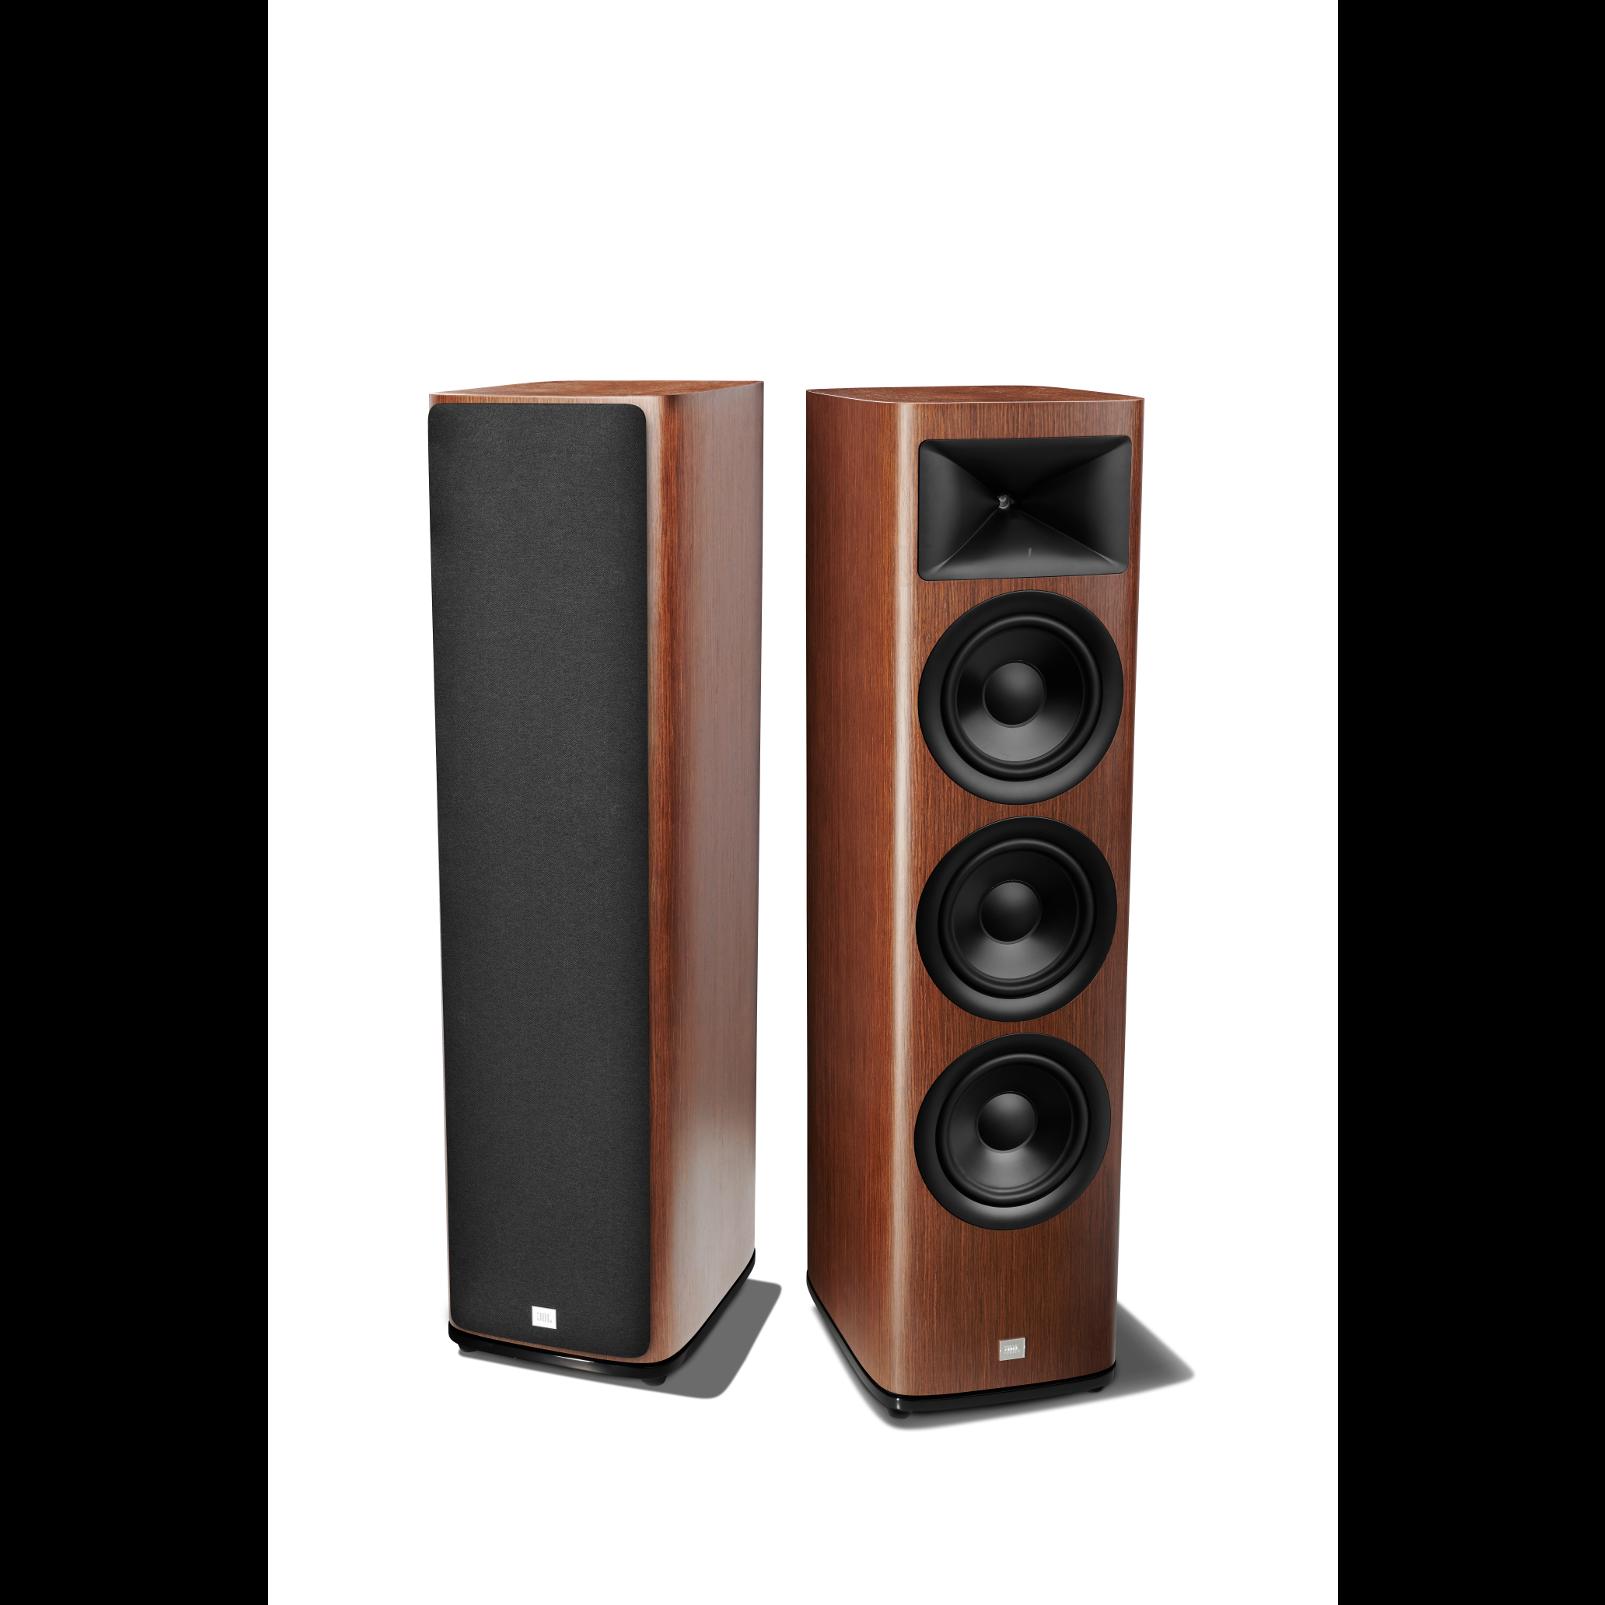 HDI-3800 - Walnut - 2 ½-way Triple 8-inch (200mm) Floorstanding Loudspeaker - Detailshot 1